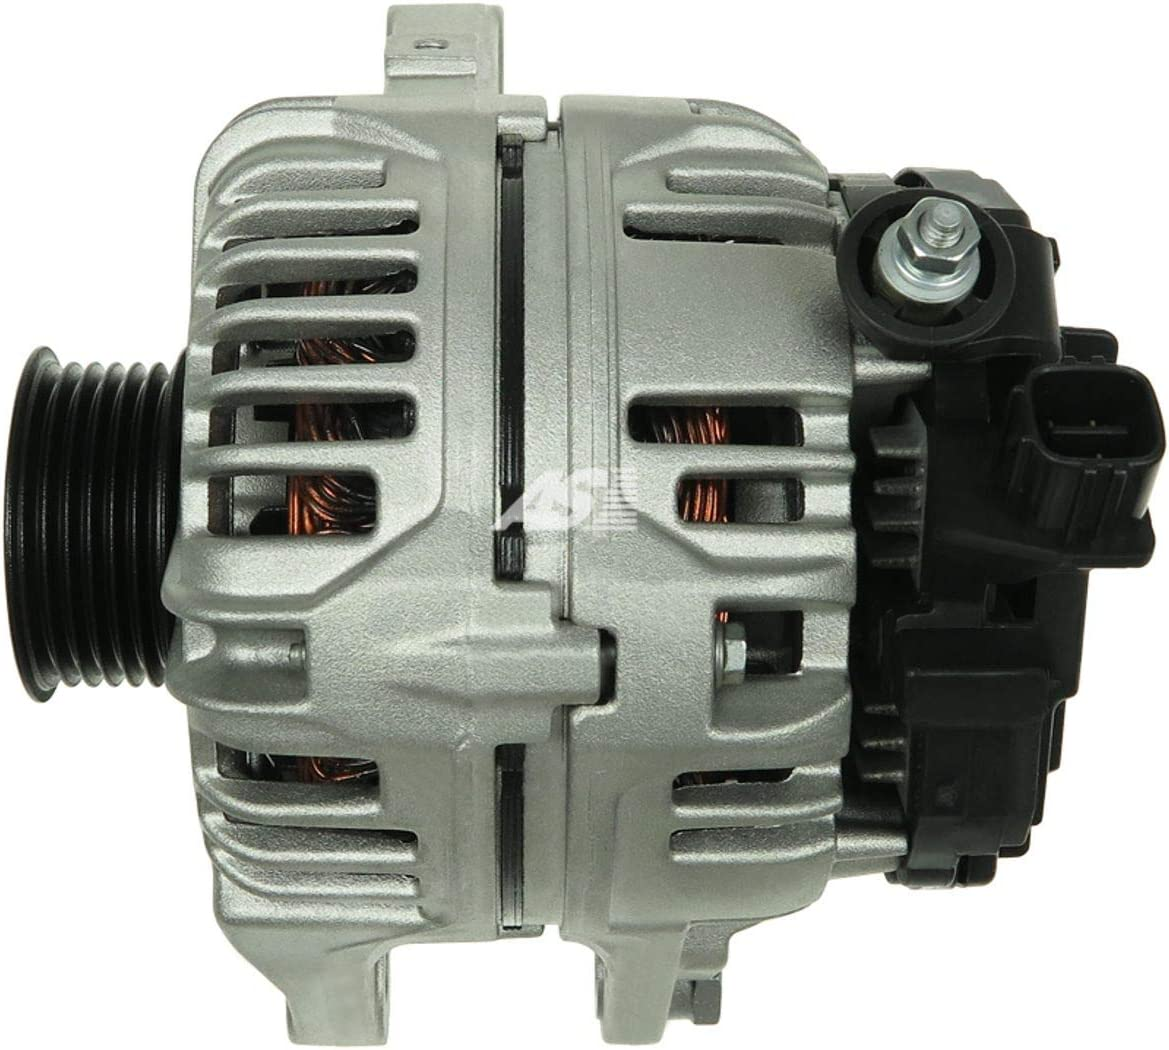 AS-PL A0256PR Alternator